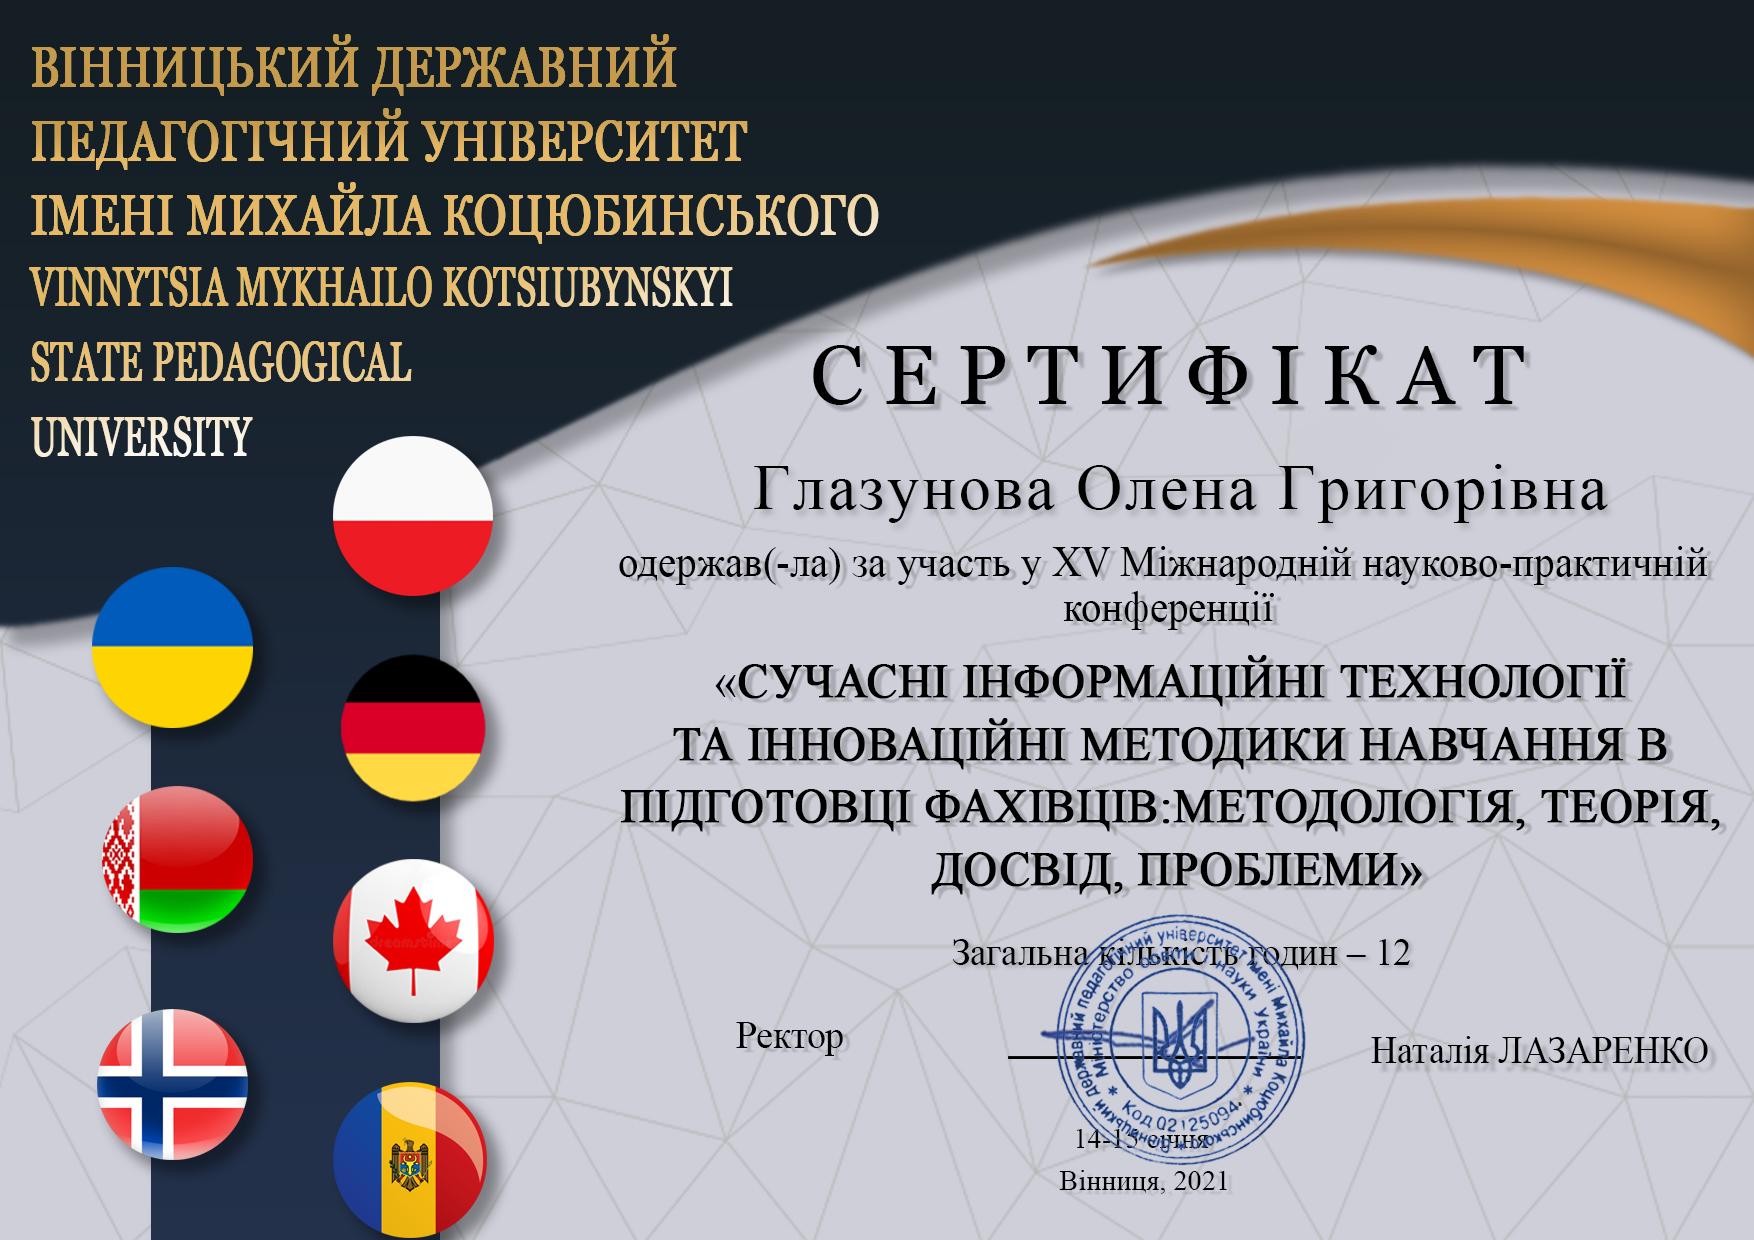 Глазунова Олена Григорівна